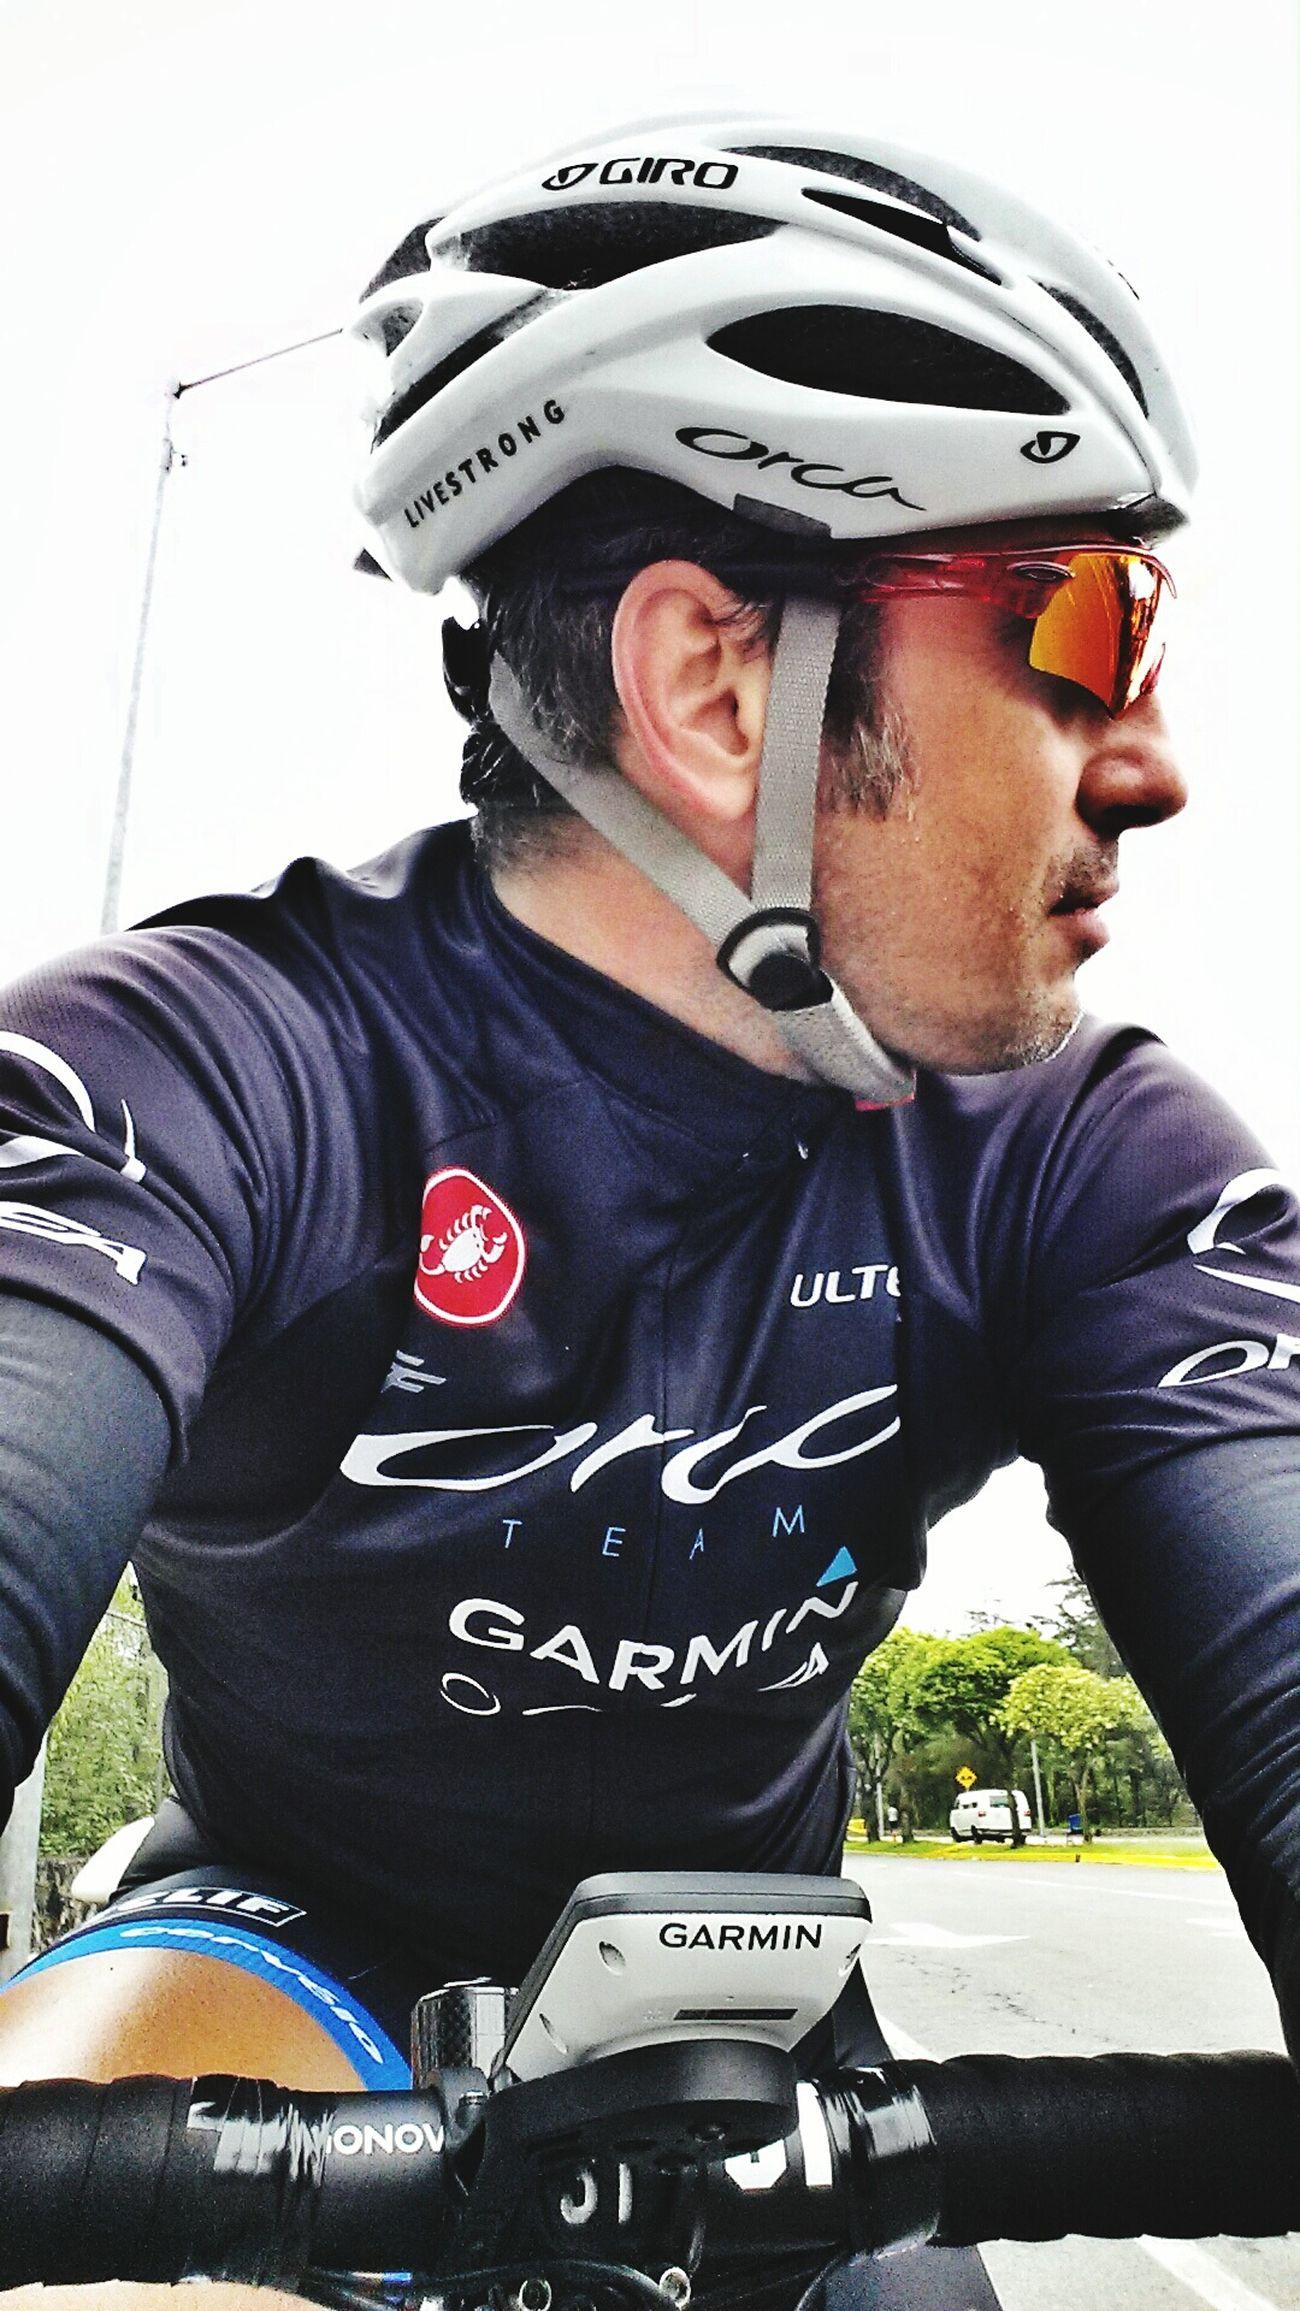 Enjoying Life Hello World Cycling Garmin Oakleysunglasses Orbea